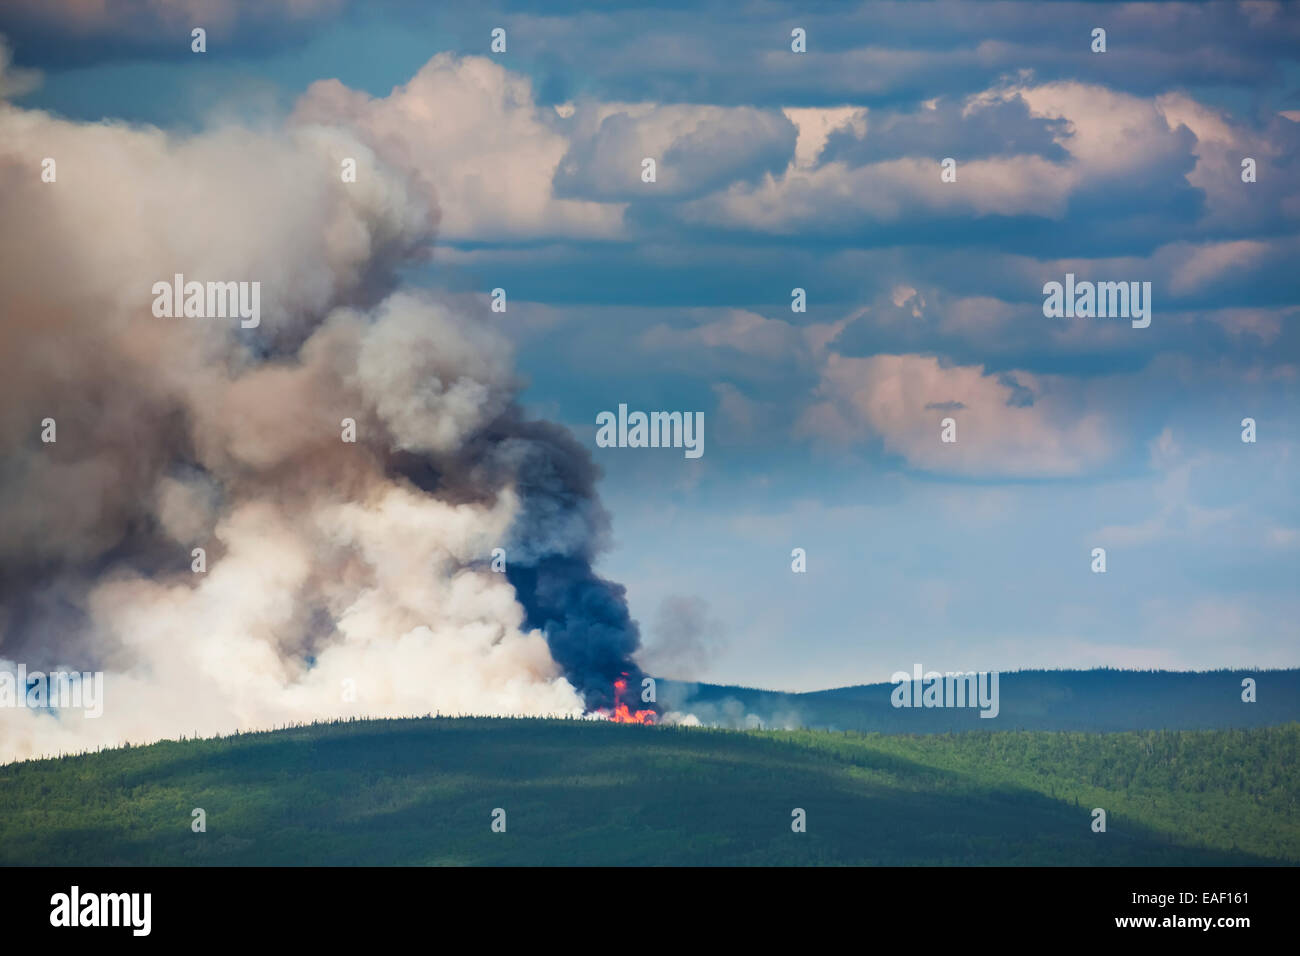 Smoke,Destruction,Alaska,Forest Fire,Forest - Stock Image